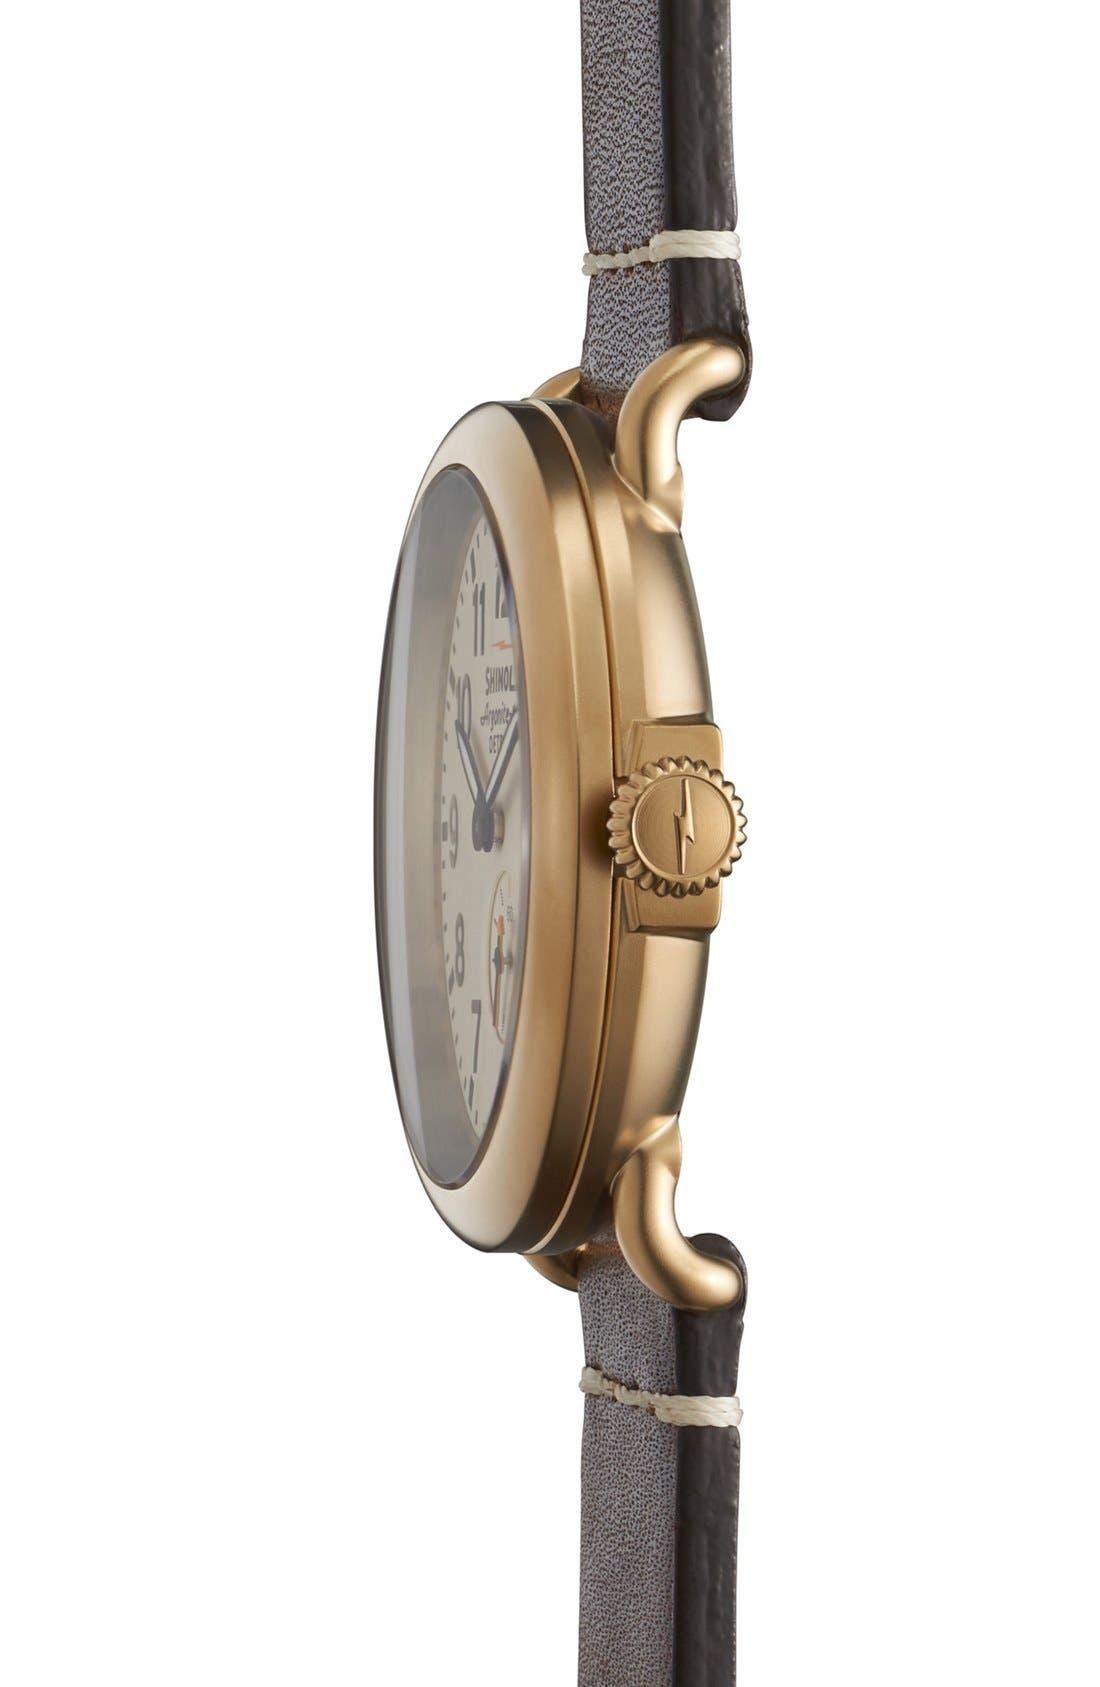 SHINOLA, 'The Runwell' Leather Strap Watch, 41mm, Alternate thumbnail 6, color, DARK COGNAC/ GUNMETAL/ GREY